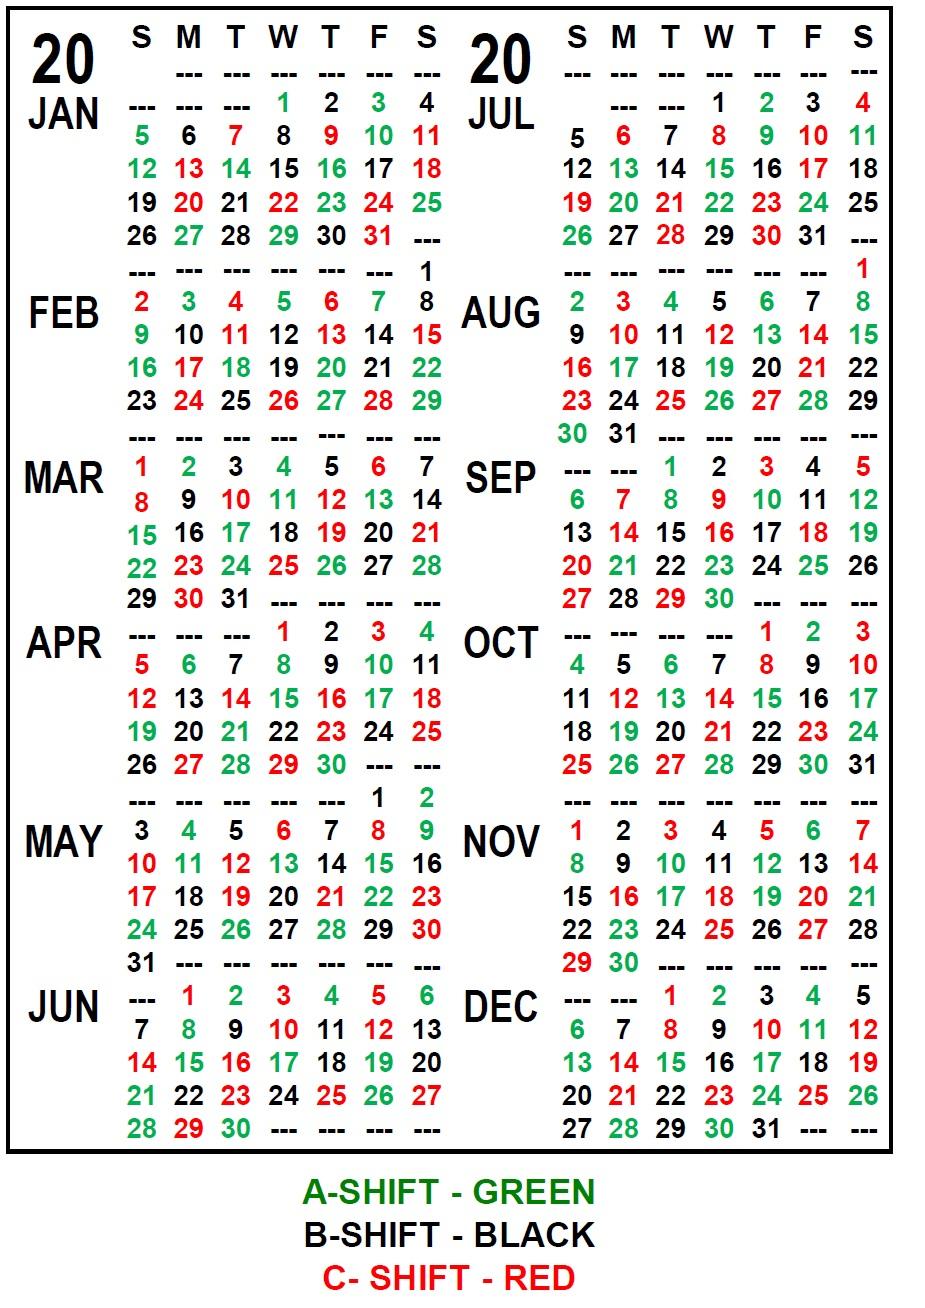 Collect Printable Firefighter Shift Calendar   Calendar regarding 2022 Hfd Shift Calendar